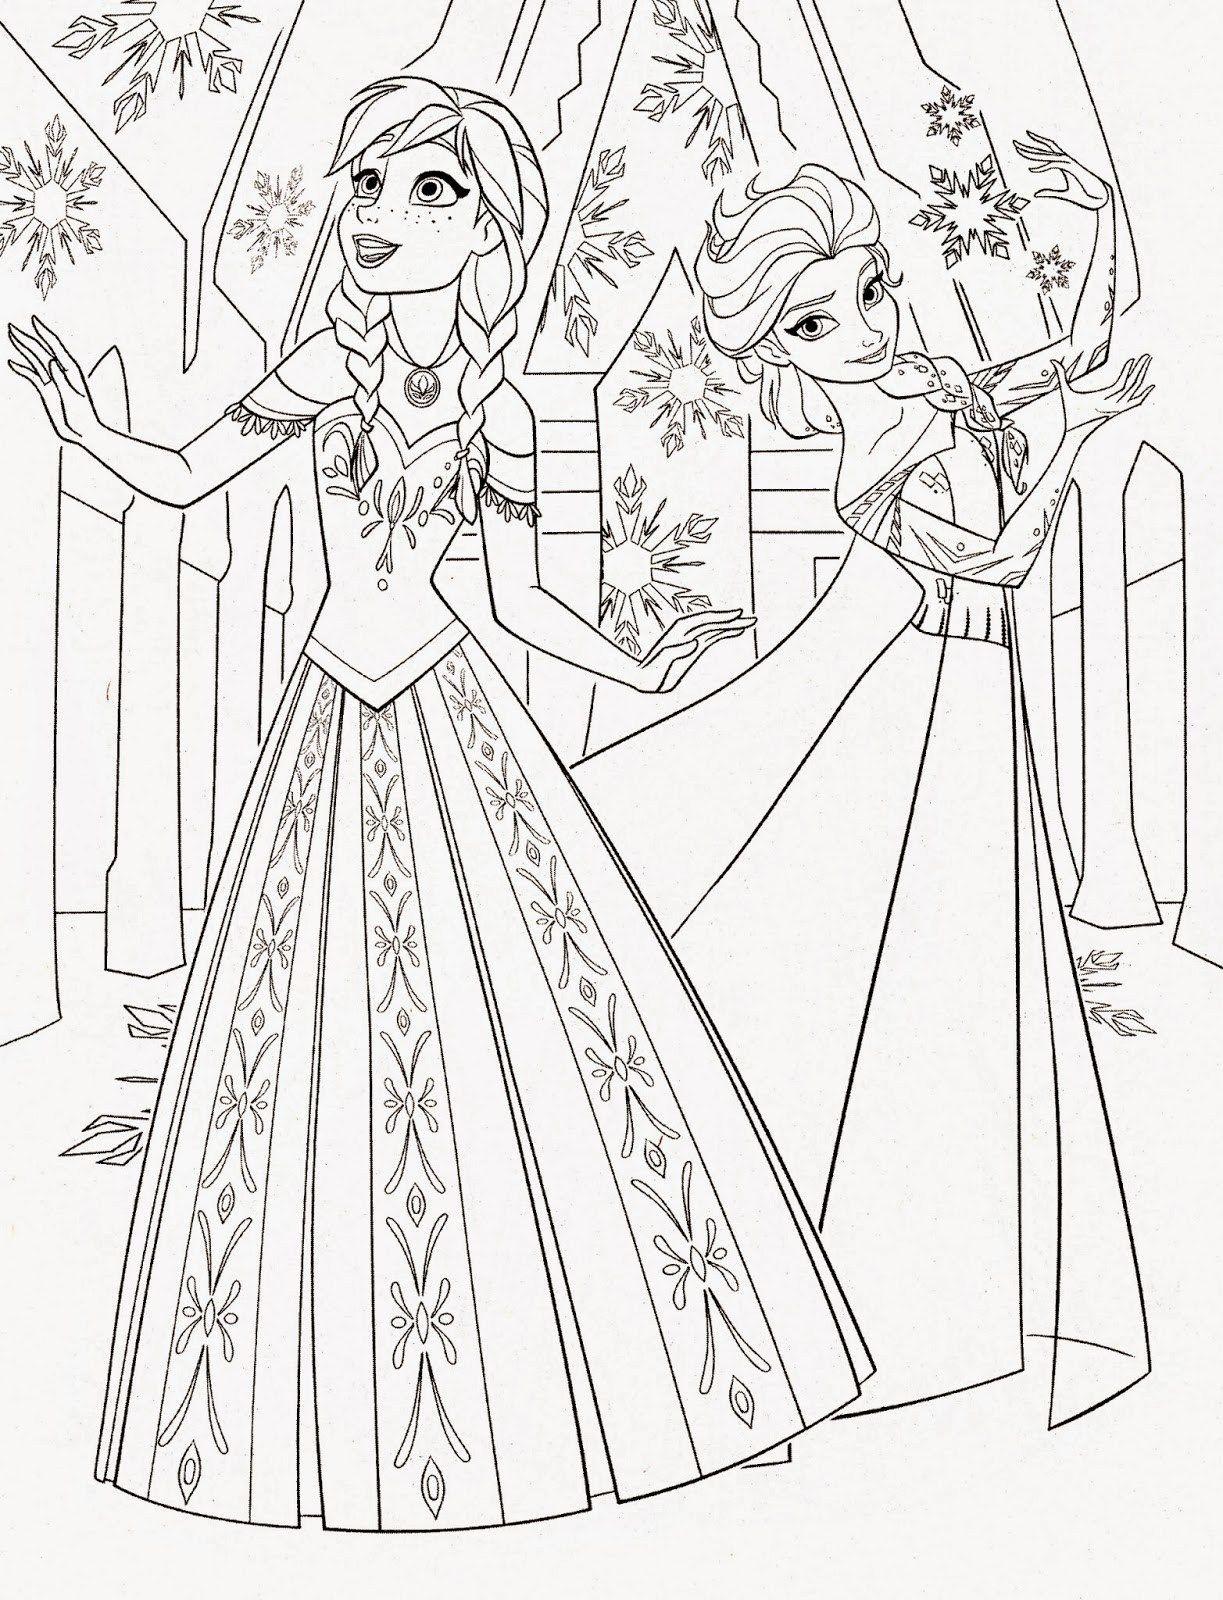 Anna Und Elsa Ausmalbild Neu Anna Elsa Ausmalbilder Best Disney Princess Frozen Elsa and Anna Fotos